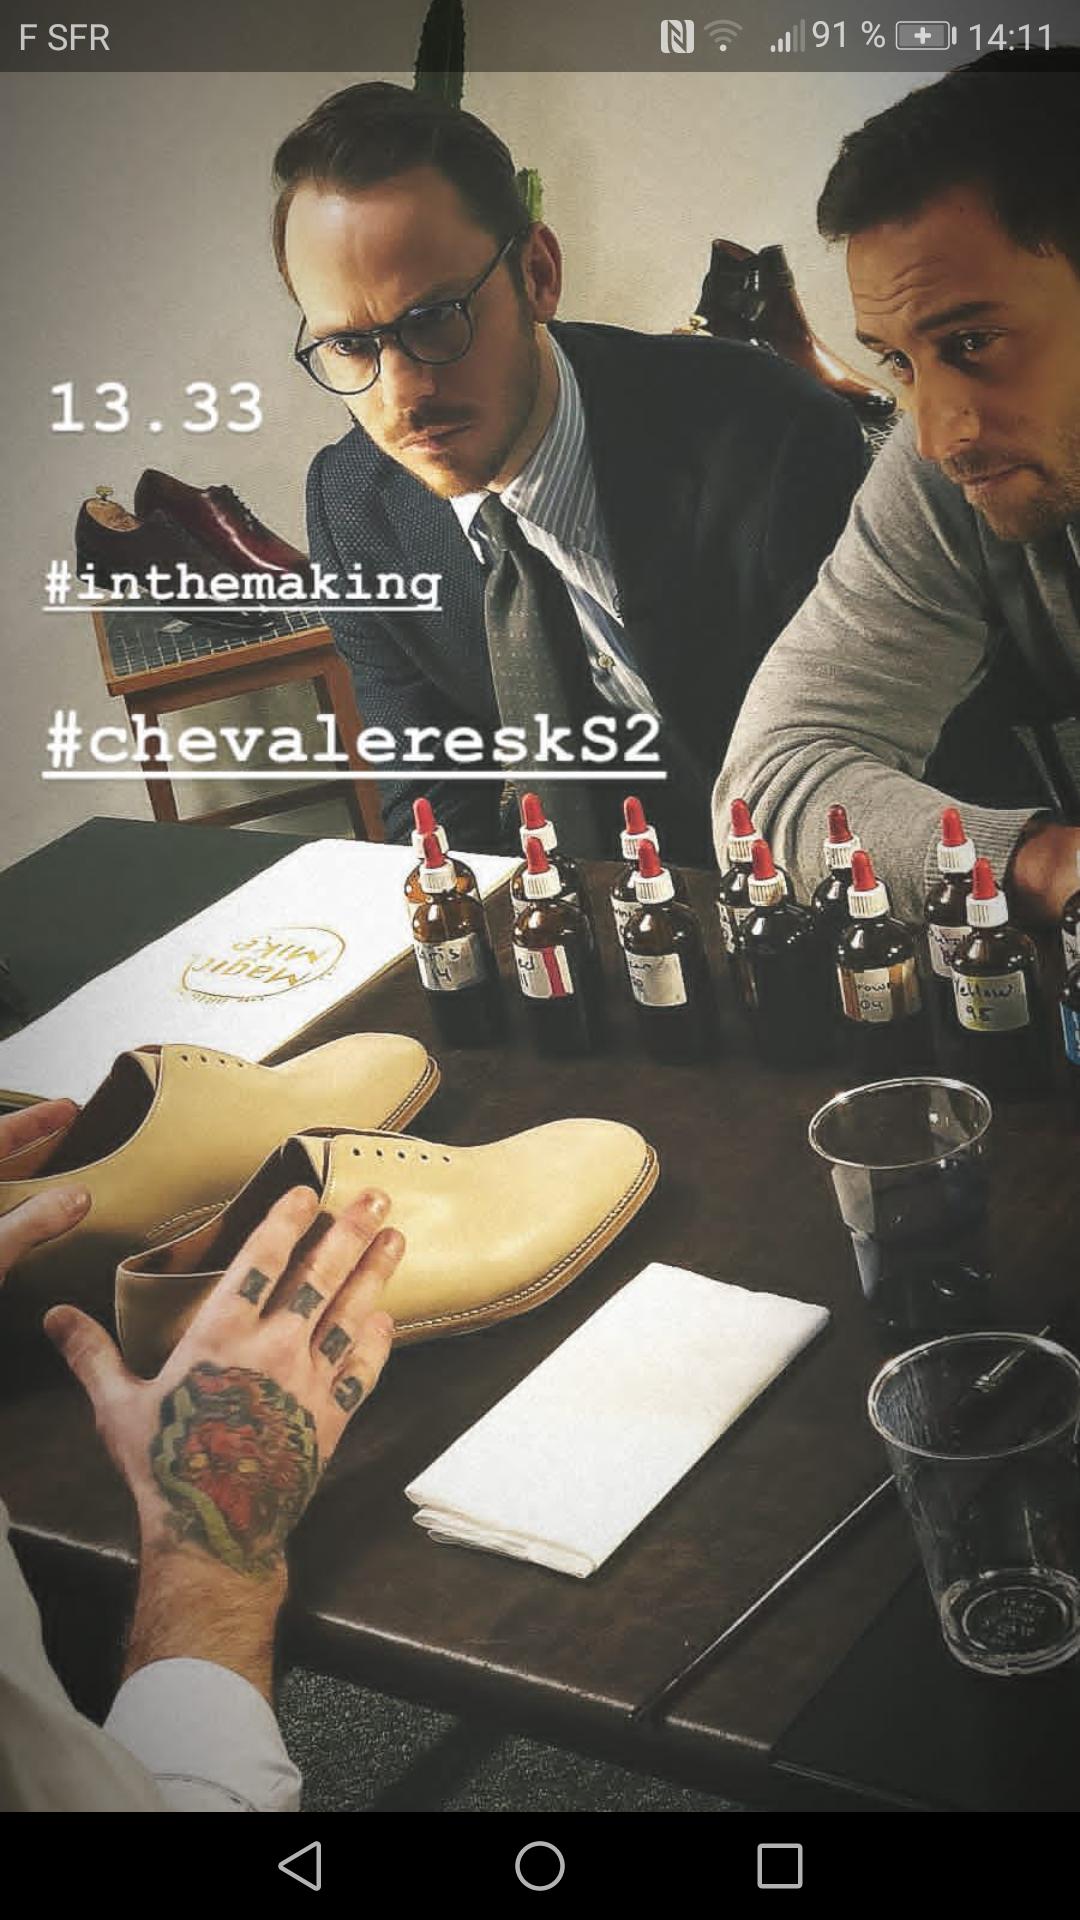 Chevaleresk season 2 shooting – part 1/3